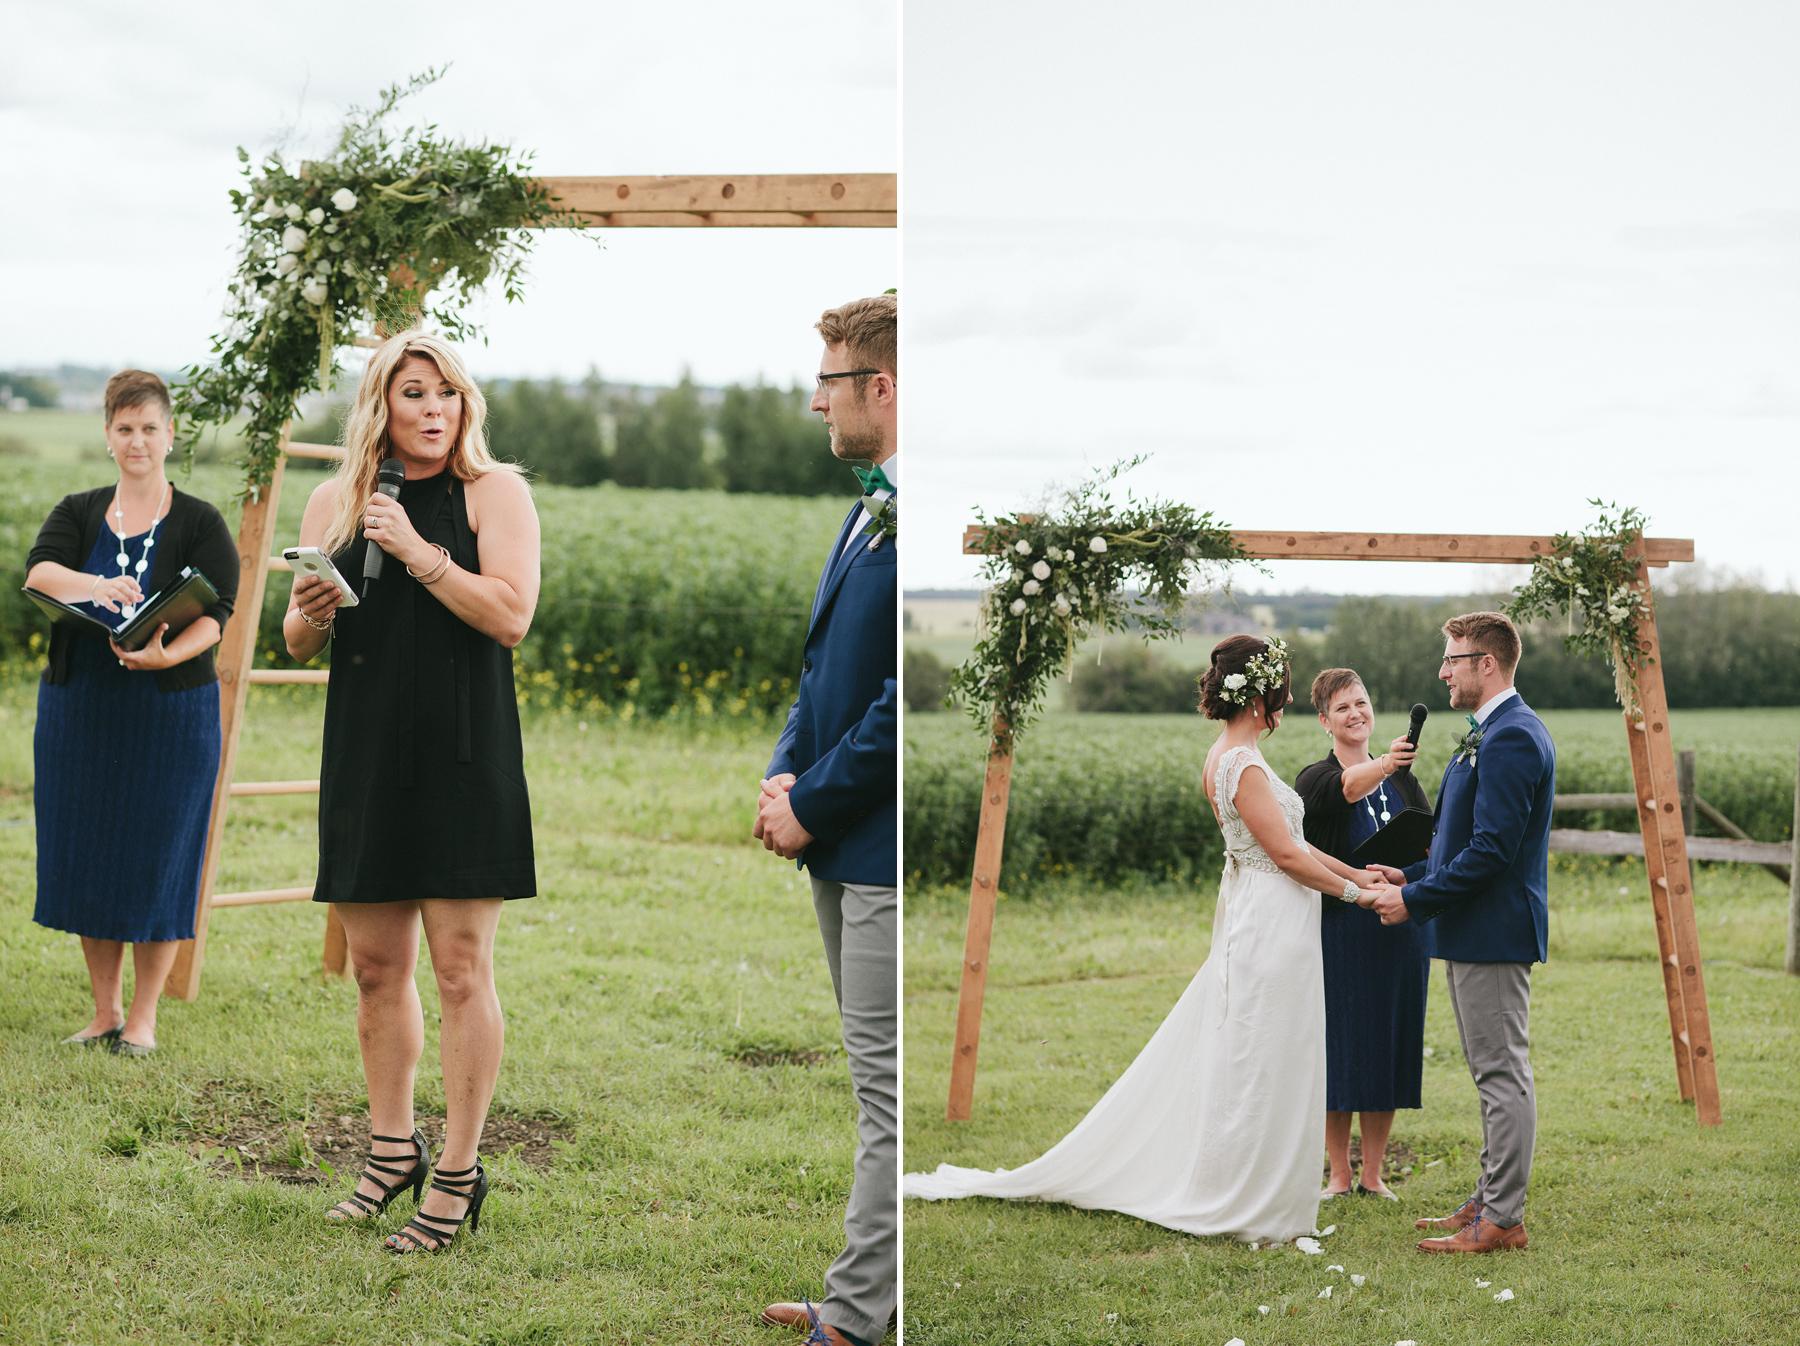 alberta-farm-wedding-photographer-rp-wj-110.jpg